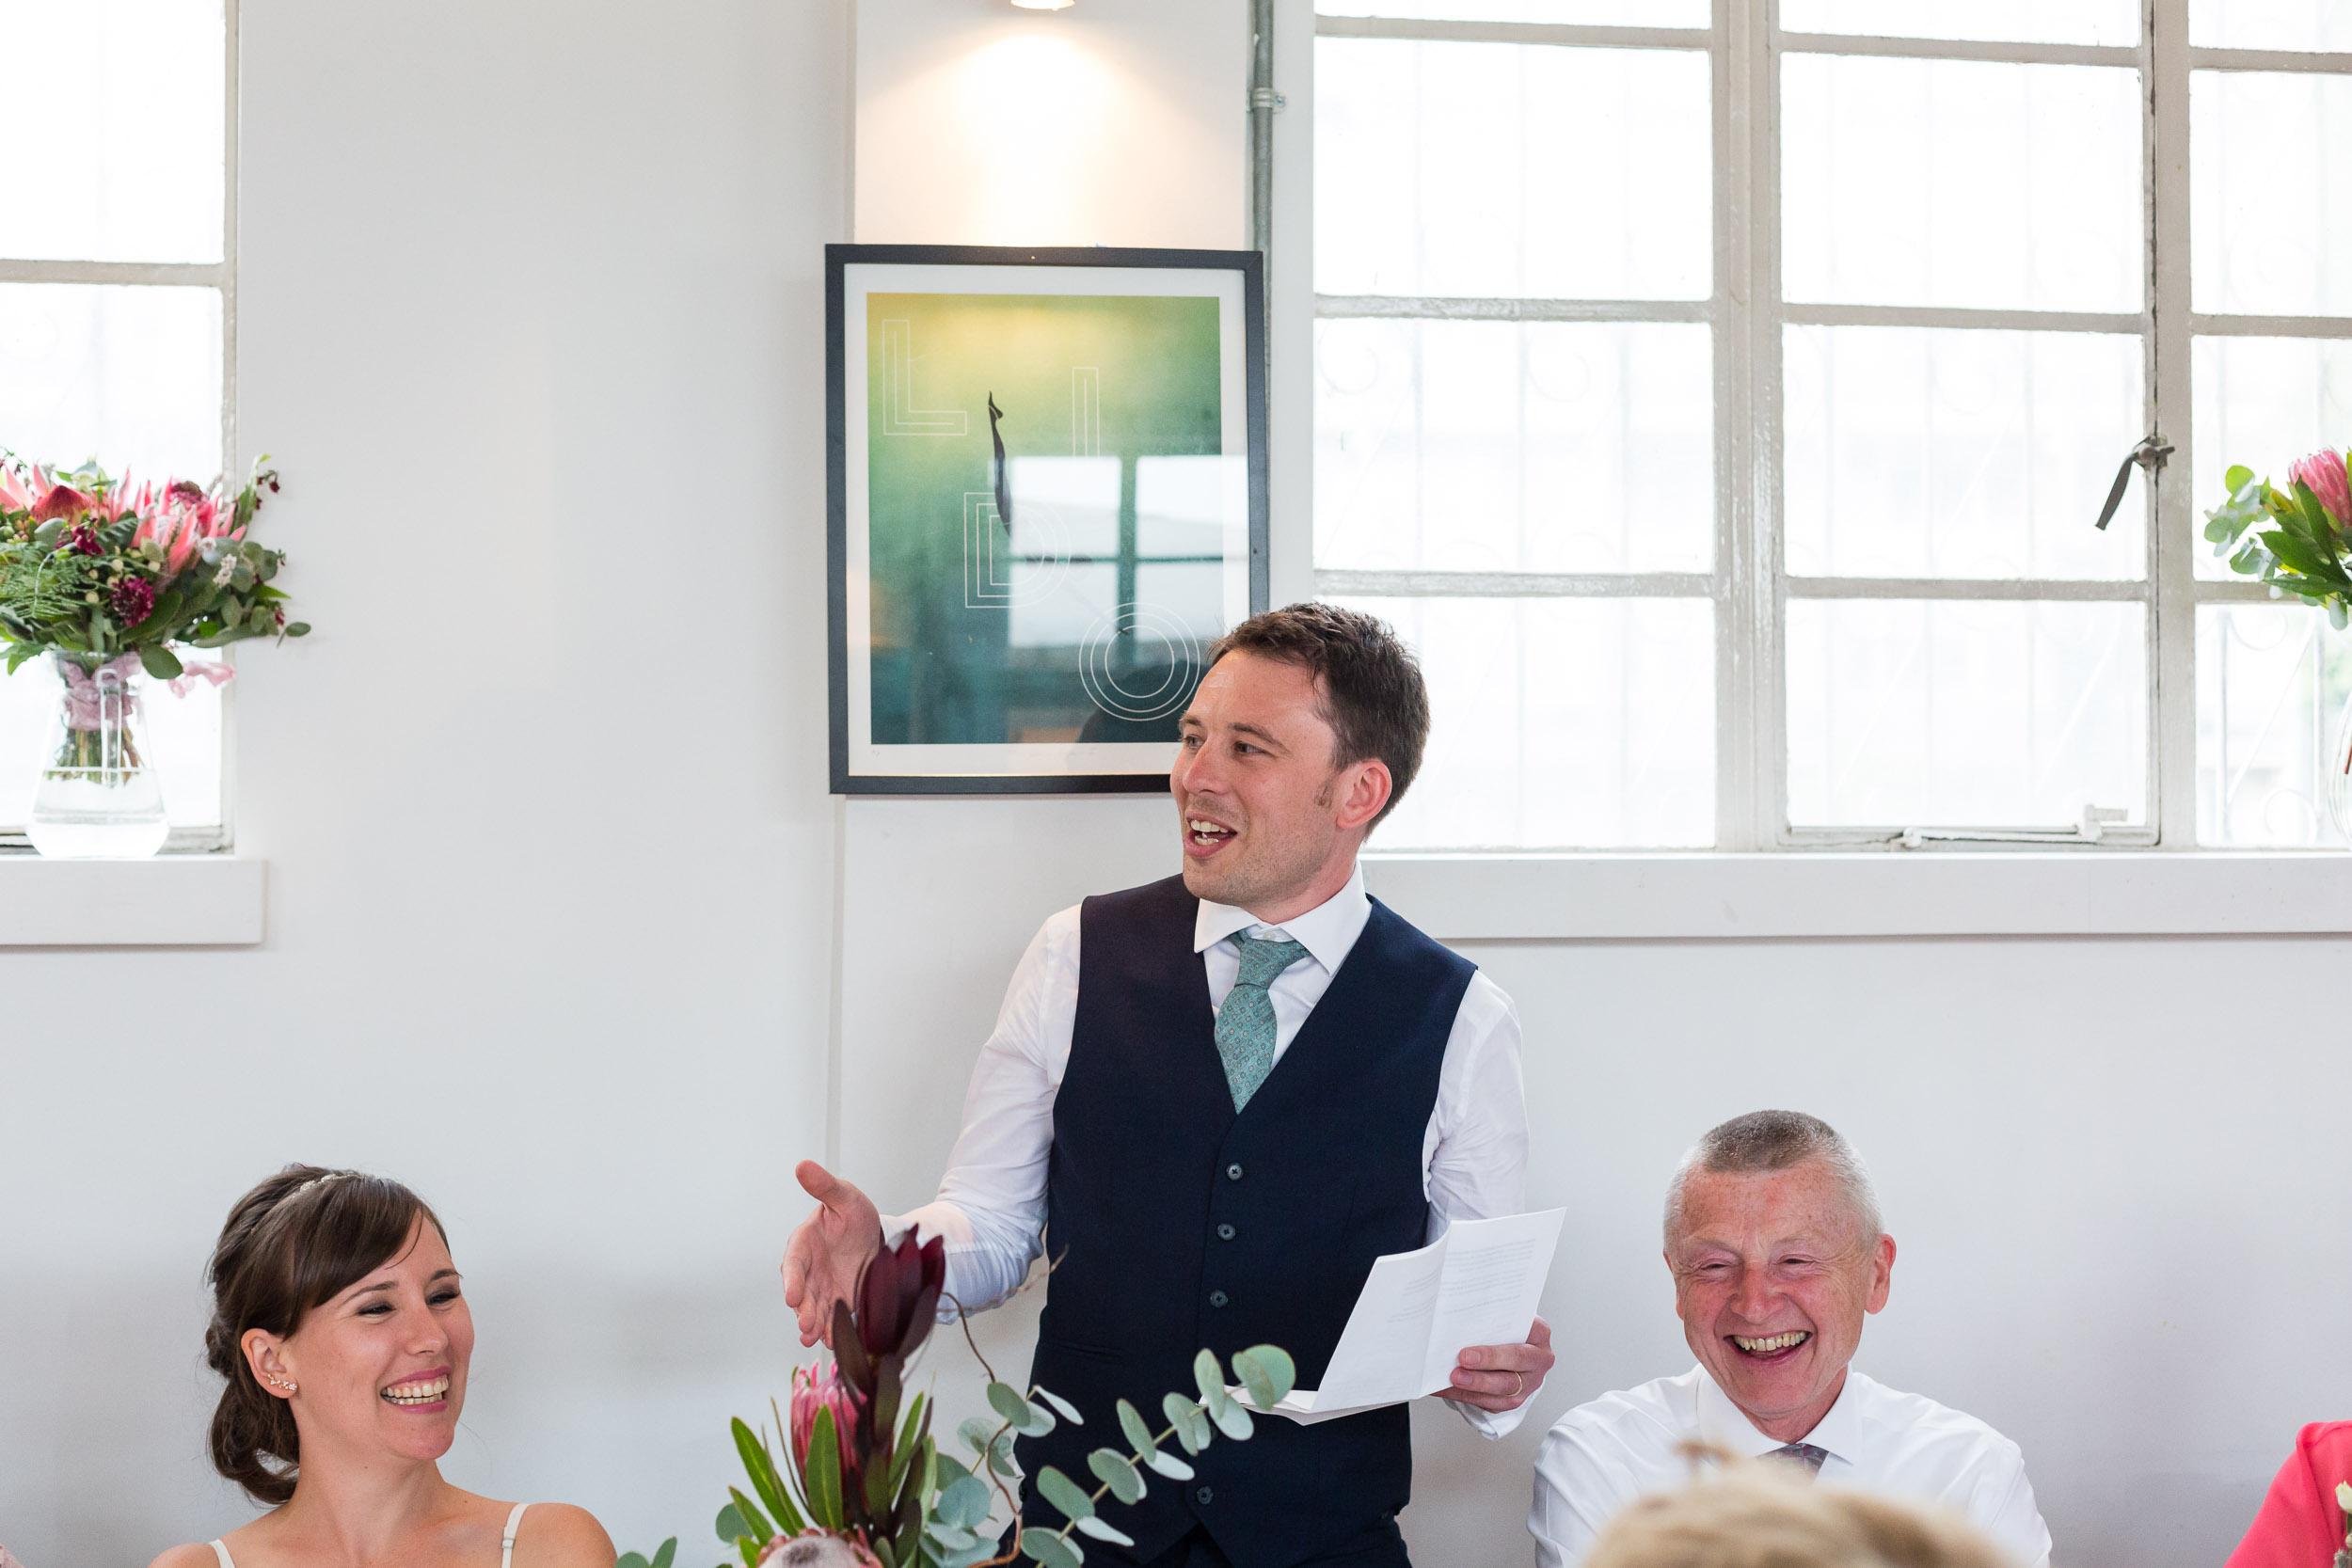 brockwell-lido-brixton-herne-hill-wedding-337.jpg